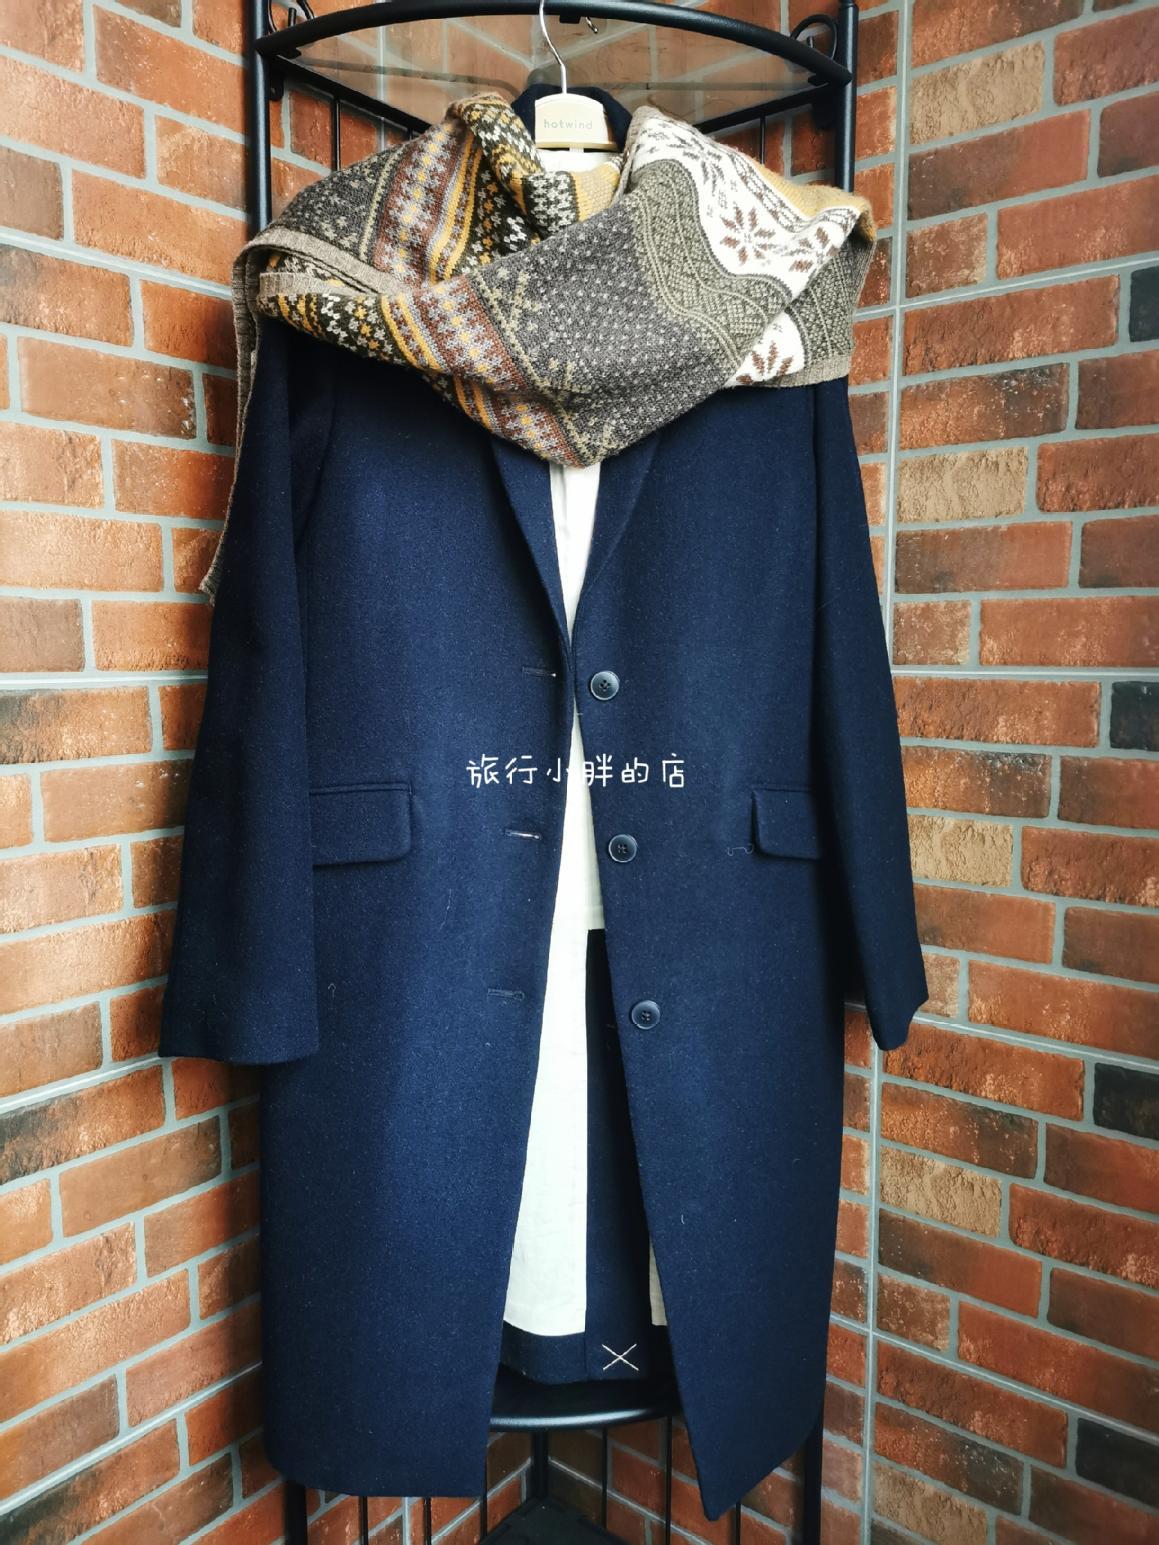 MUJI良品計画の中で長いウールのコートのチェスターのまっすぐな筒は単に女性の紺青の秋冬を掛けて郵送します。